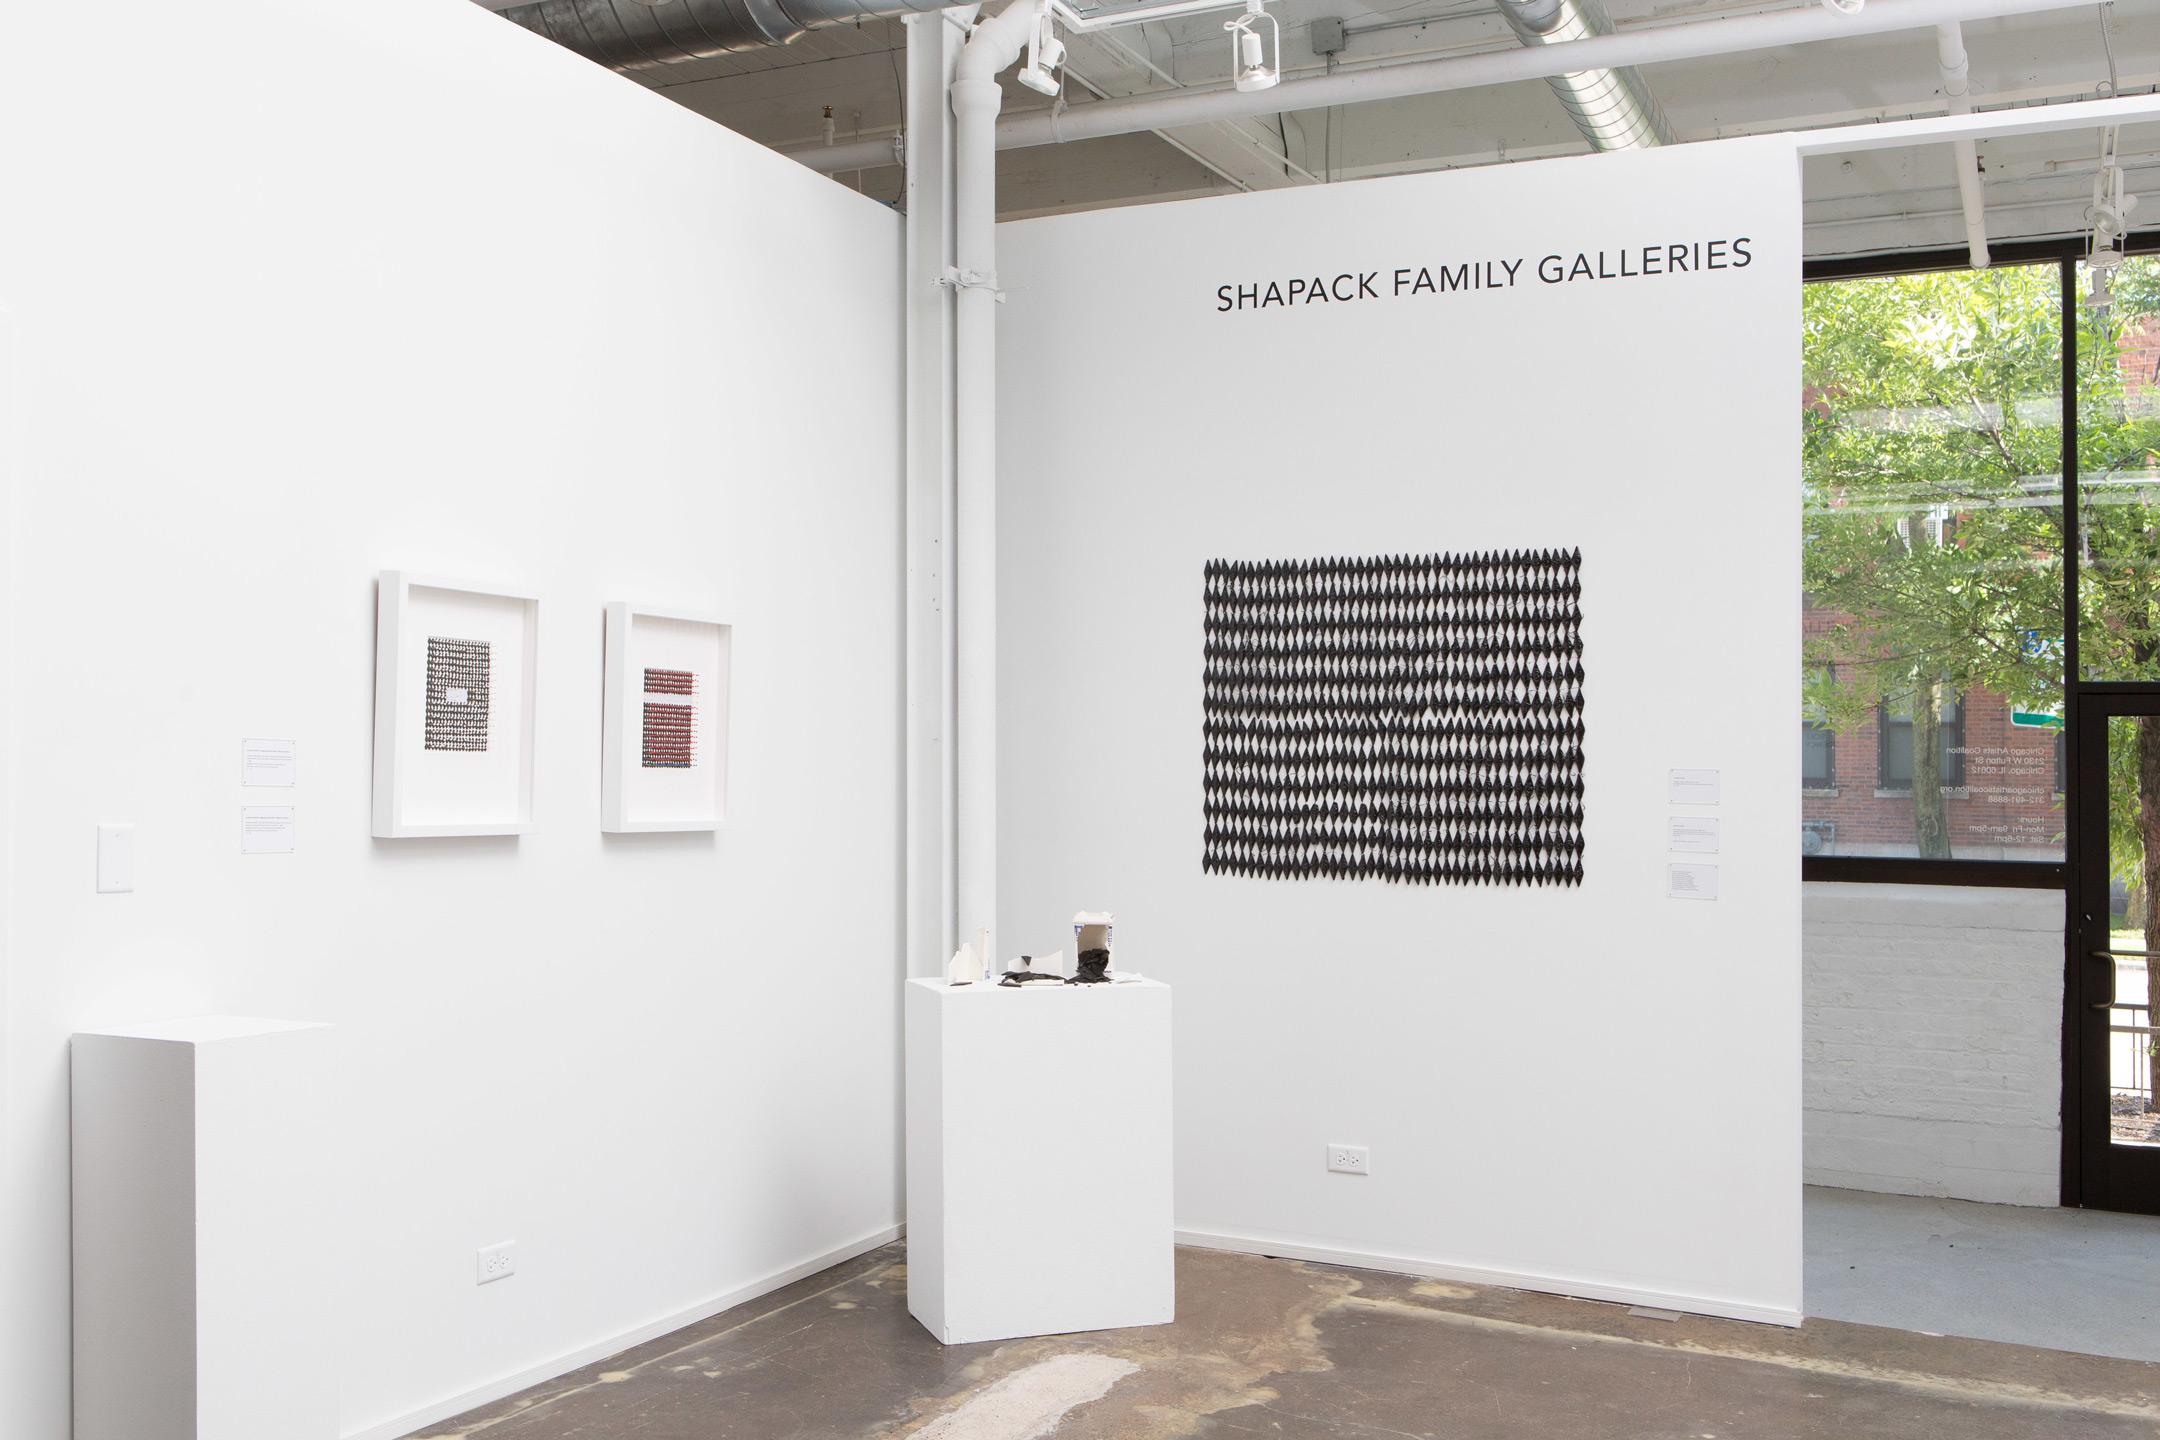 Jacqueline-Surdell-Artist-Installation-Kerk-Straat-Orwellian-Offspring-Work-01.jpg